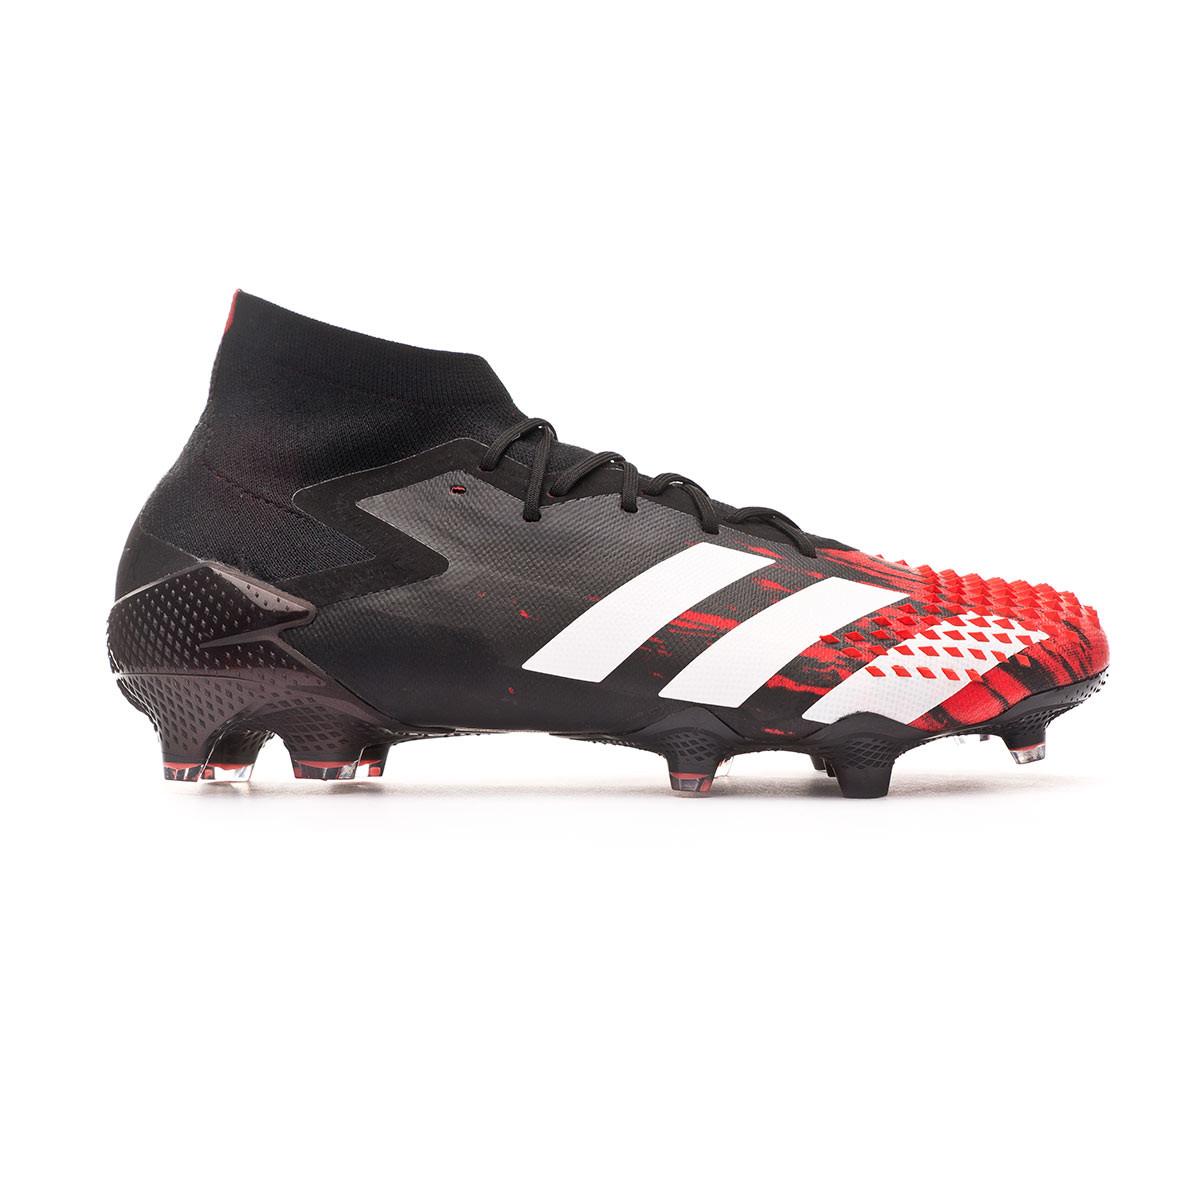 Cornualles Deliberadamente ligero  Football Boots adidas Predator 20.1 FG Core black-White-Active red -  Football store Fútbol Emotion